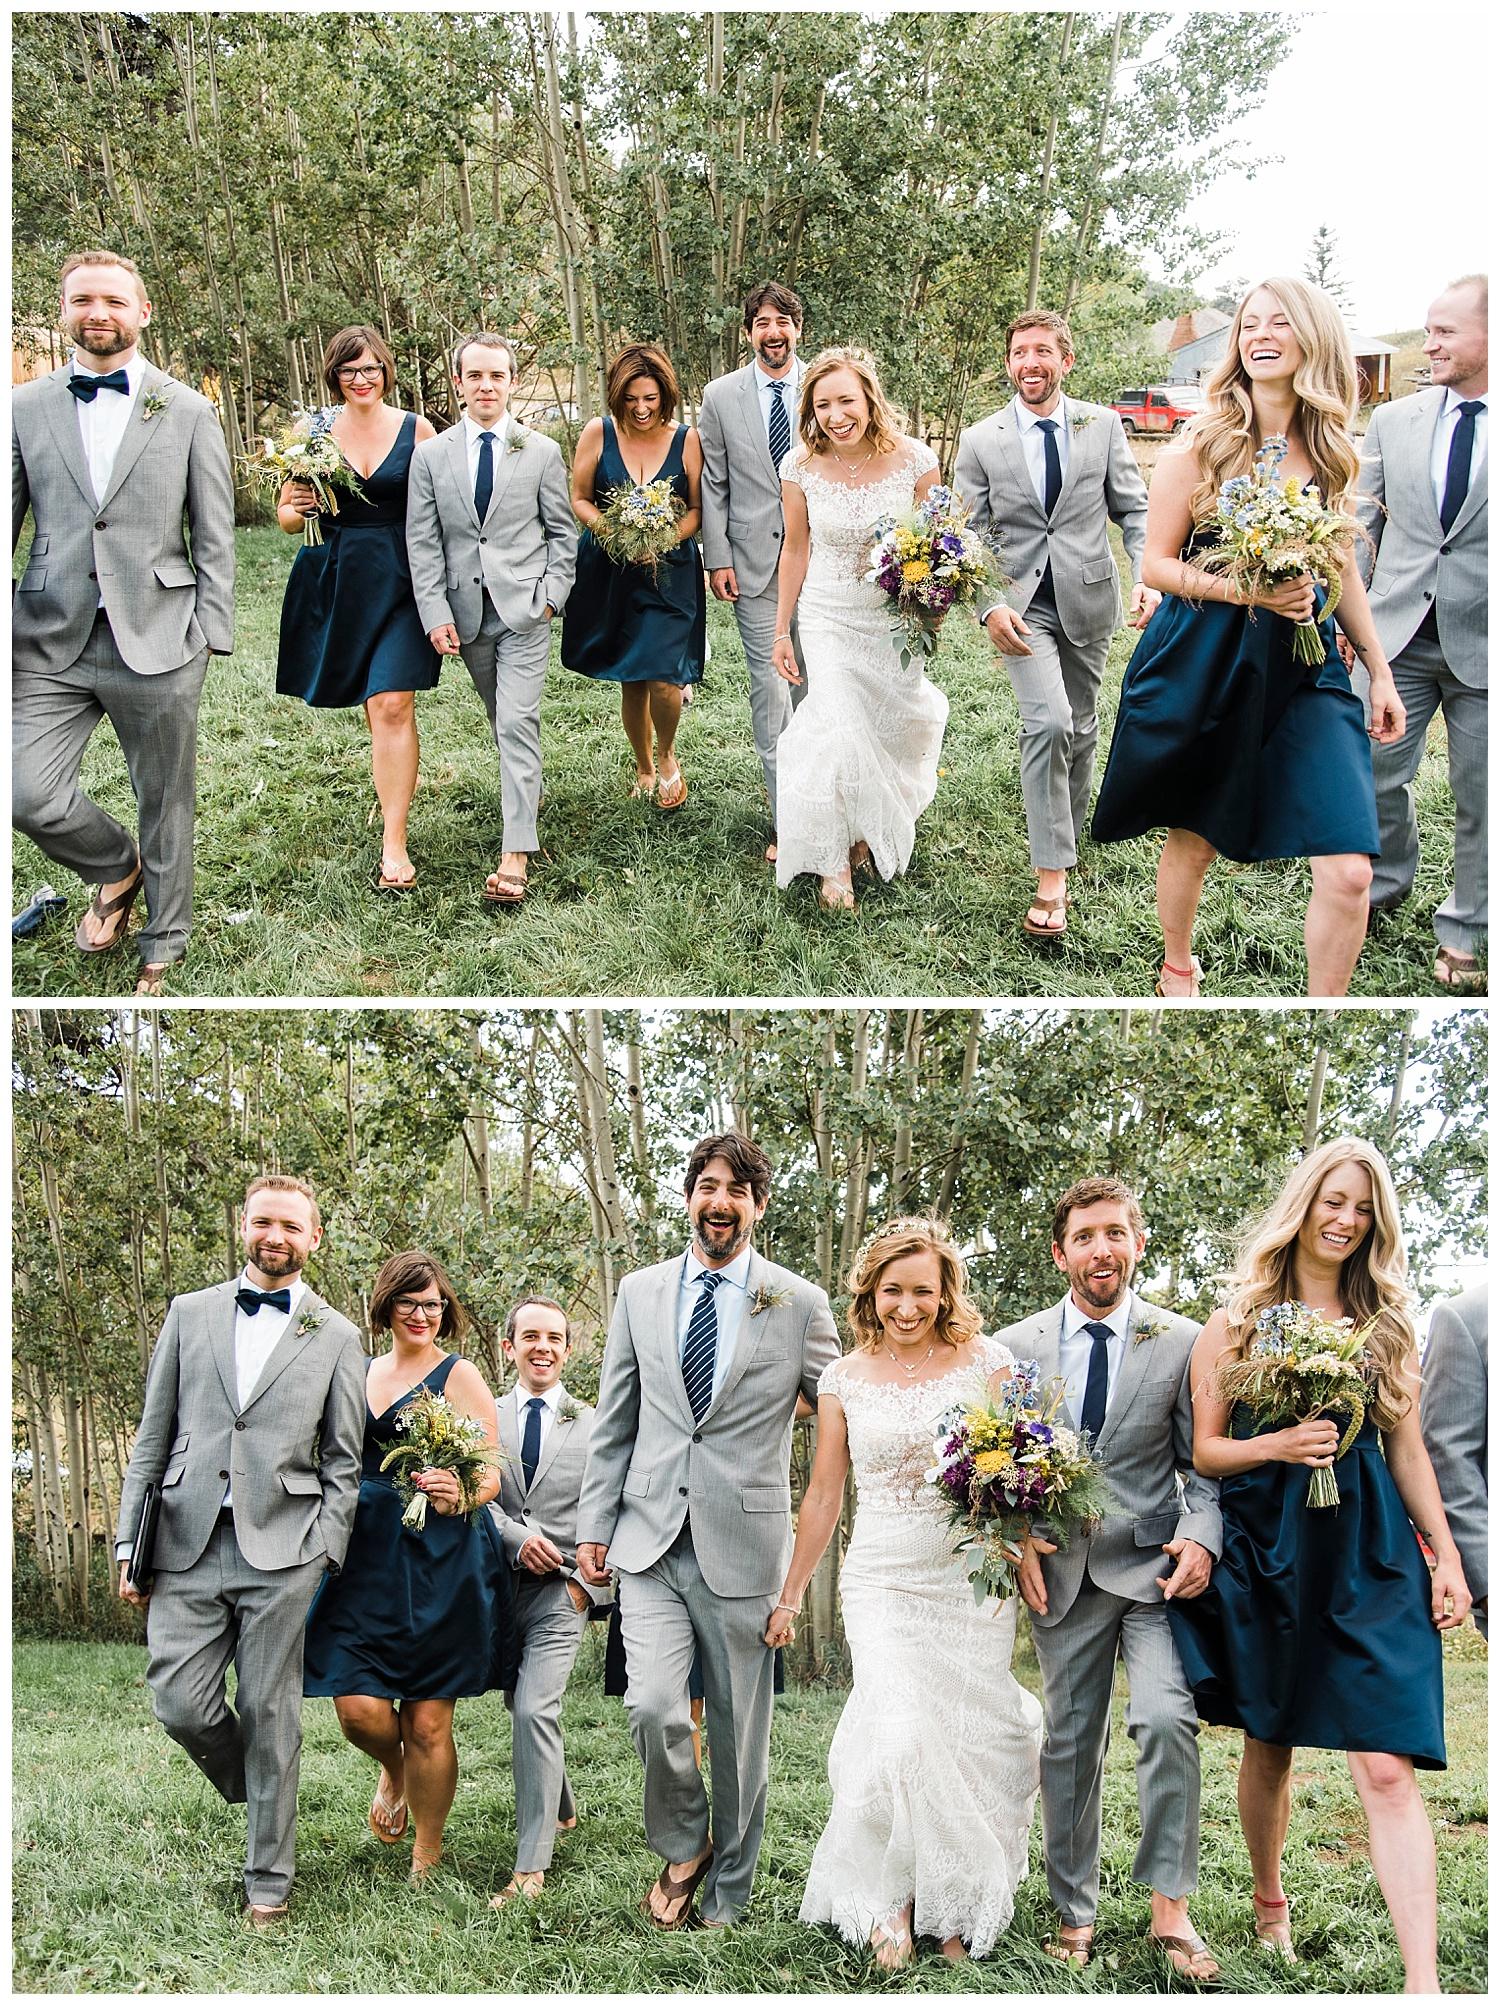 Gold_Hill_Inn_Wedding_Boulder_CO_Apollo_Fields_452.jpg